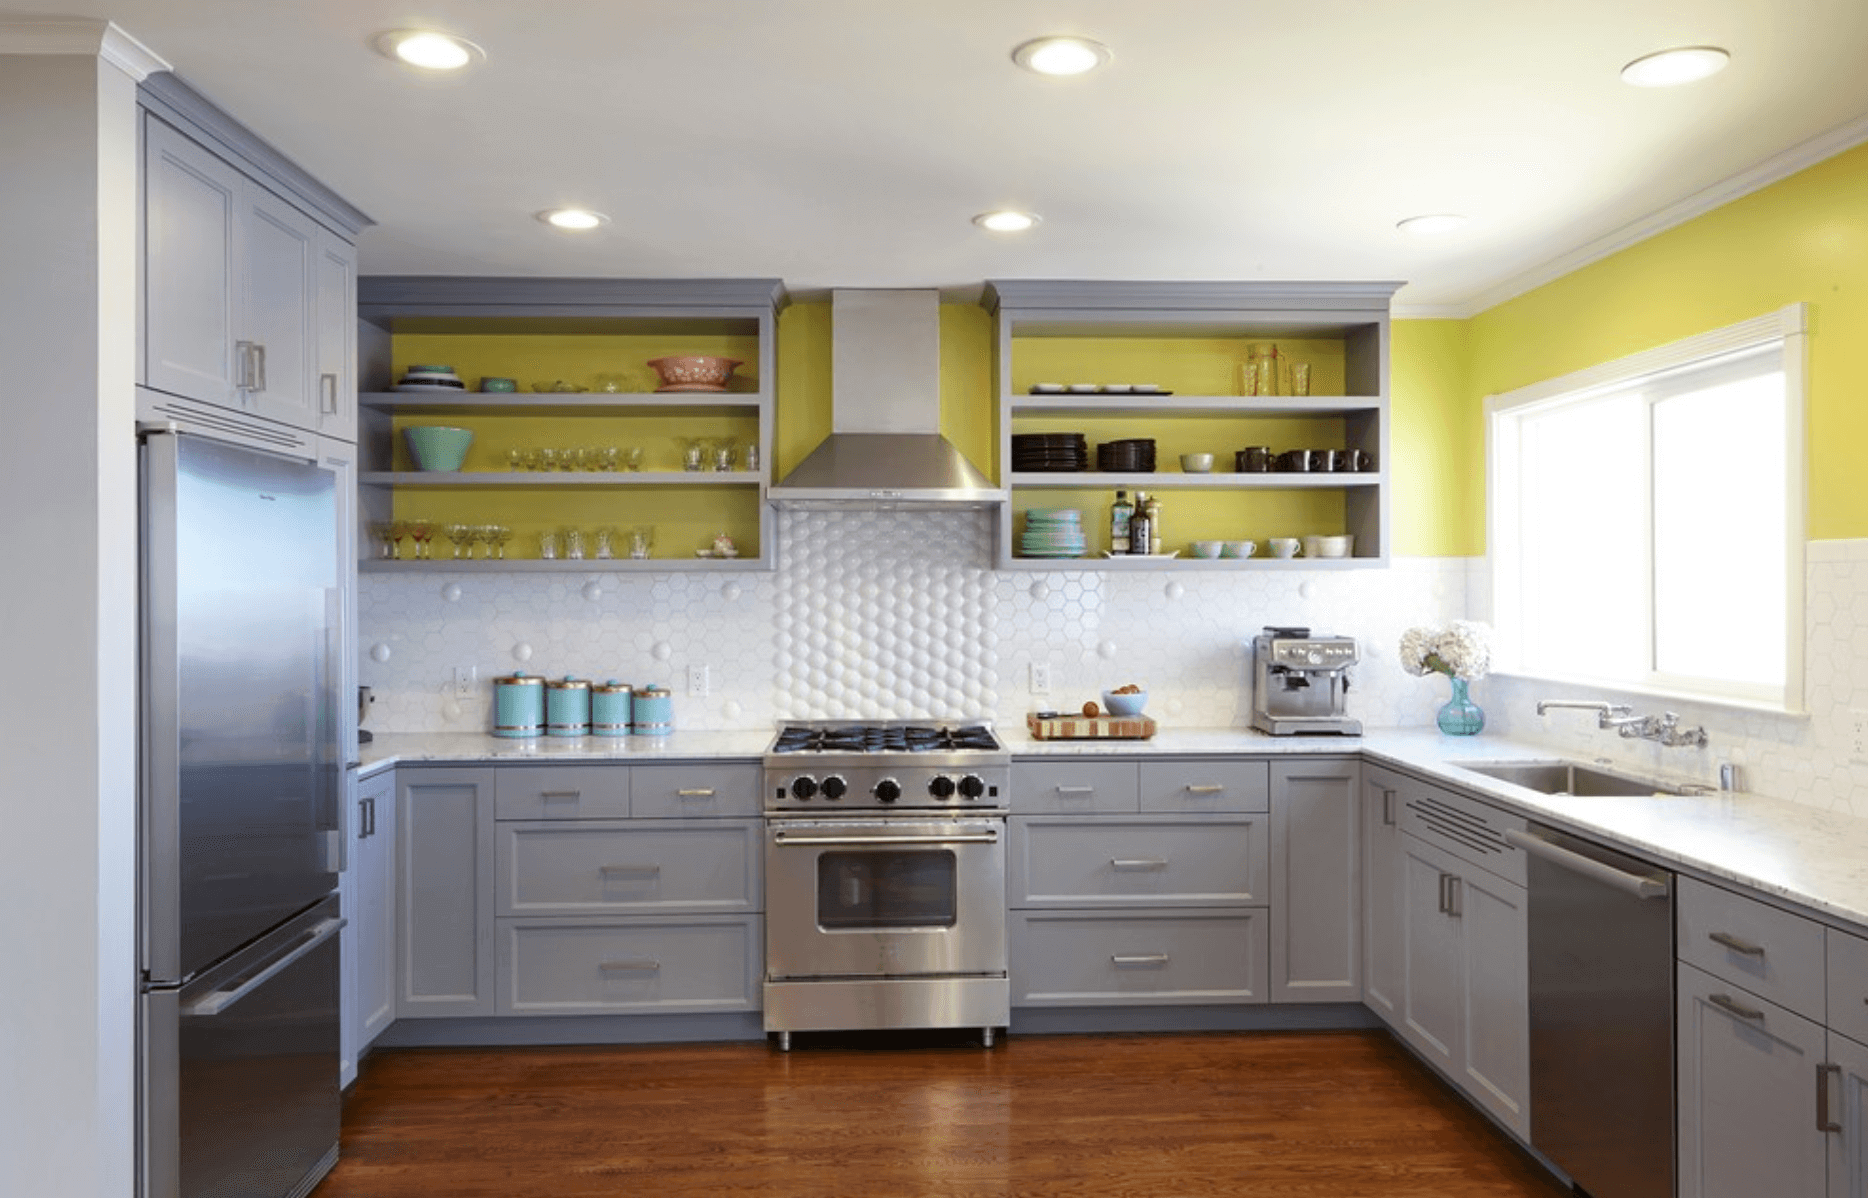 53 Creative Kitchen Color Ideas To Make Your Space Shine Kitchen Backsplash Trends Modern Kitchen Design Inside Kitchen Cabinets